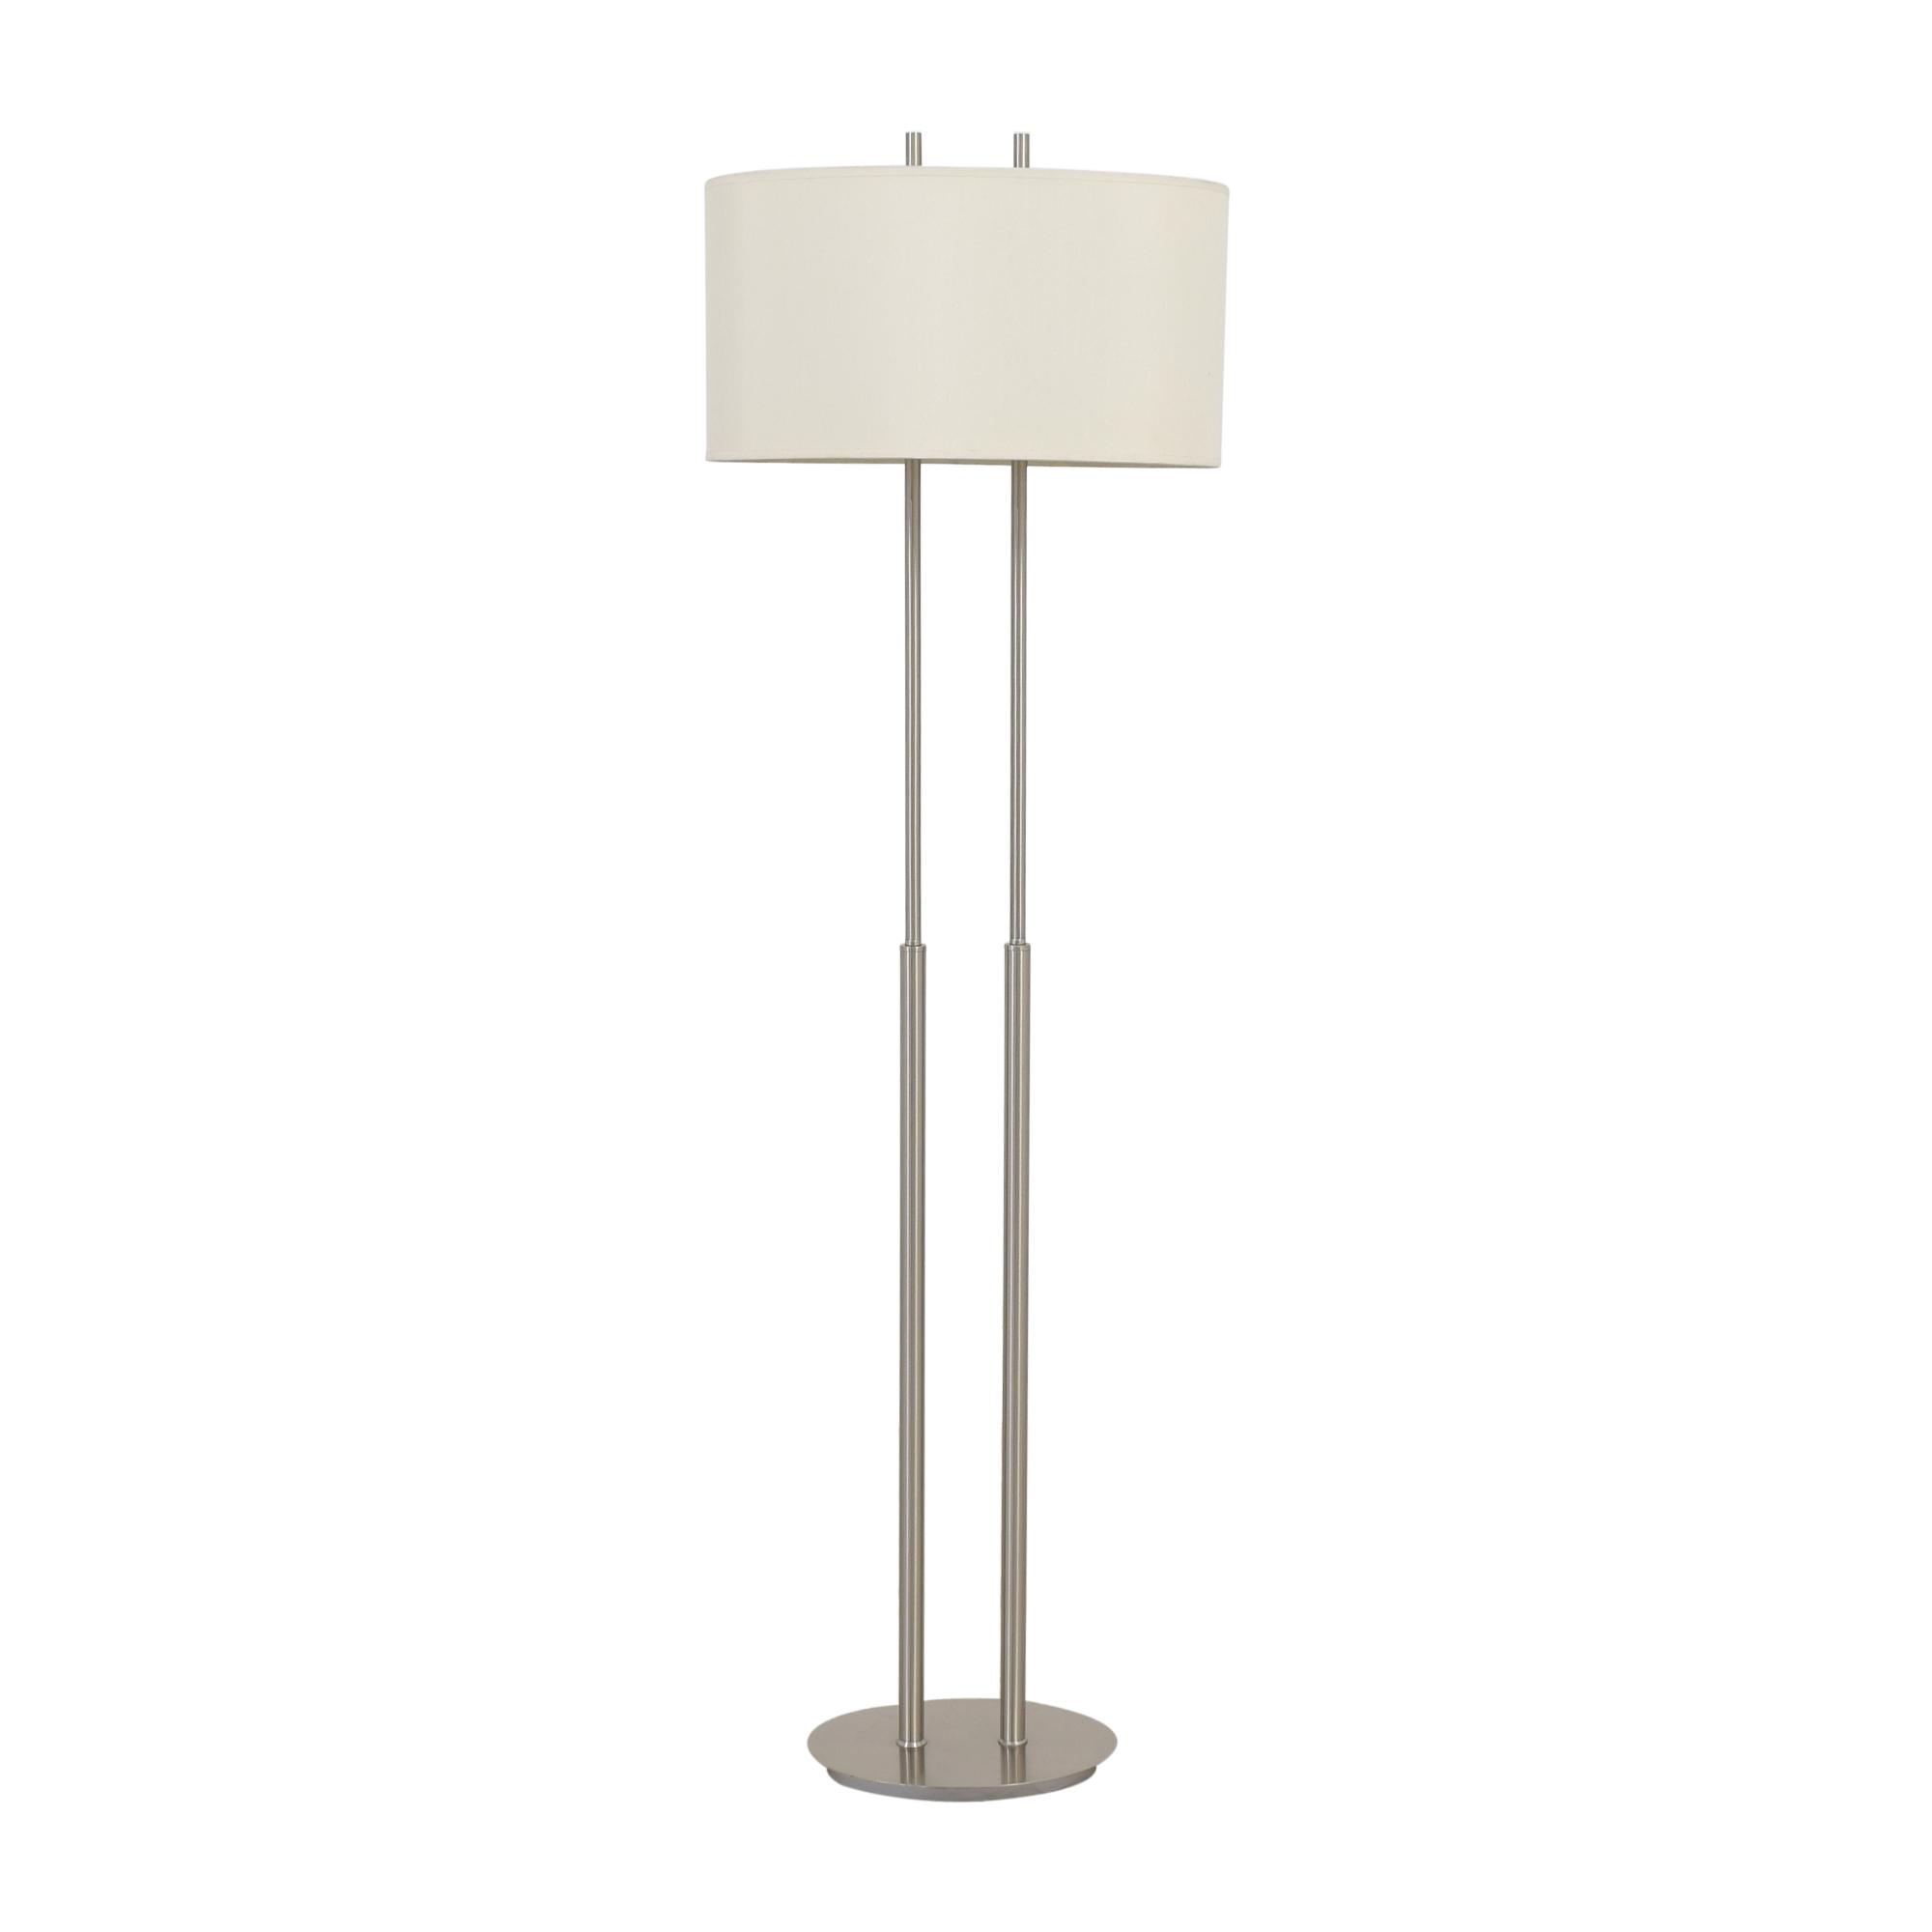 Parallel Bars Floor Lamp on sale